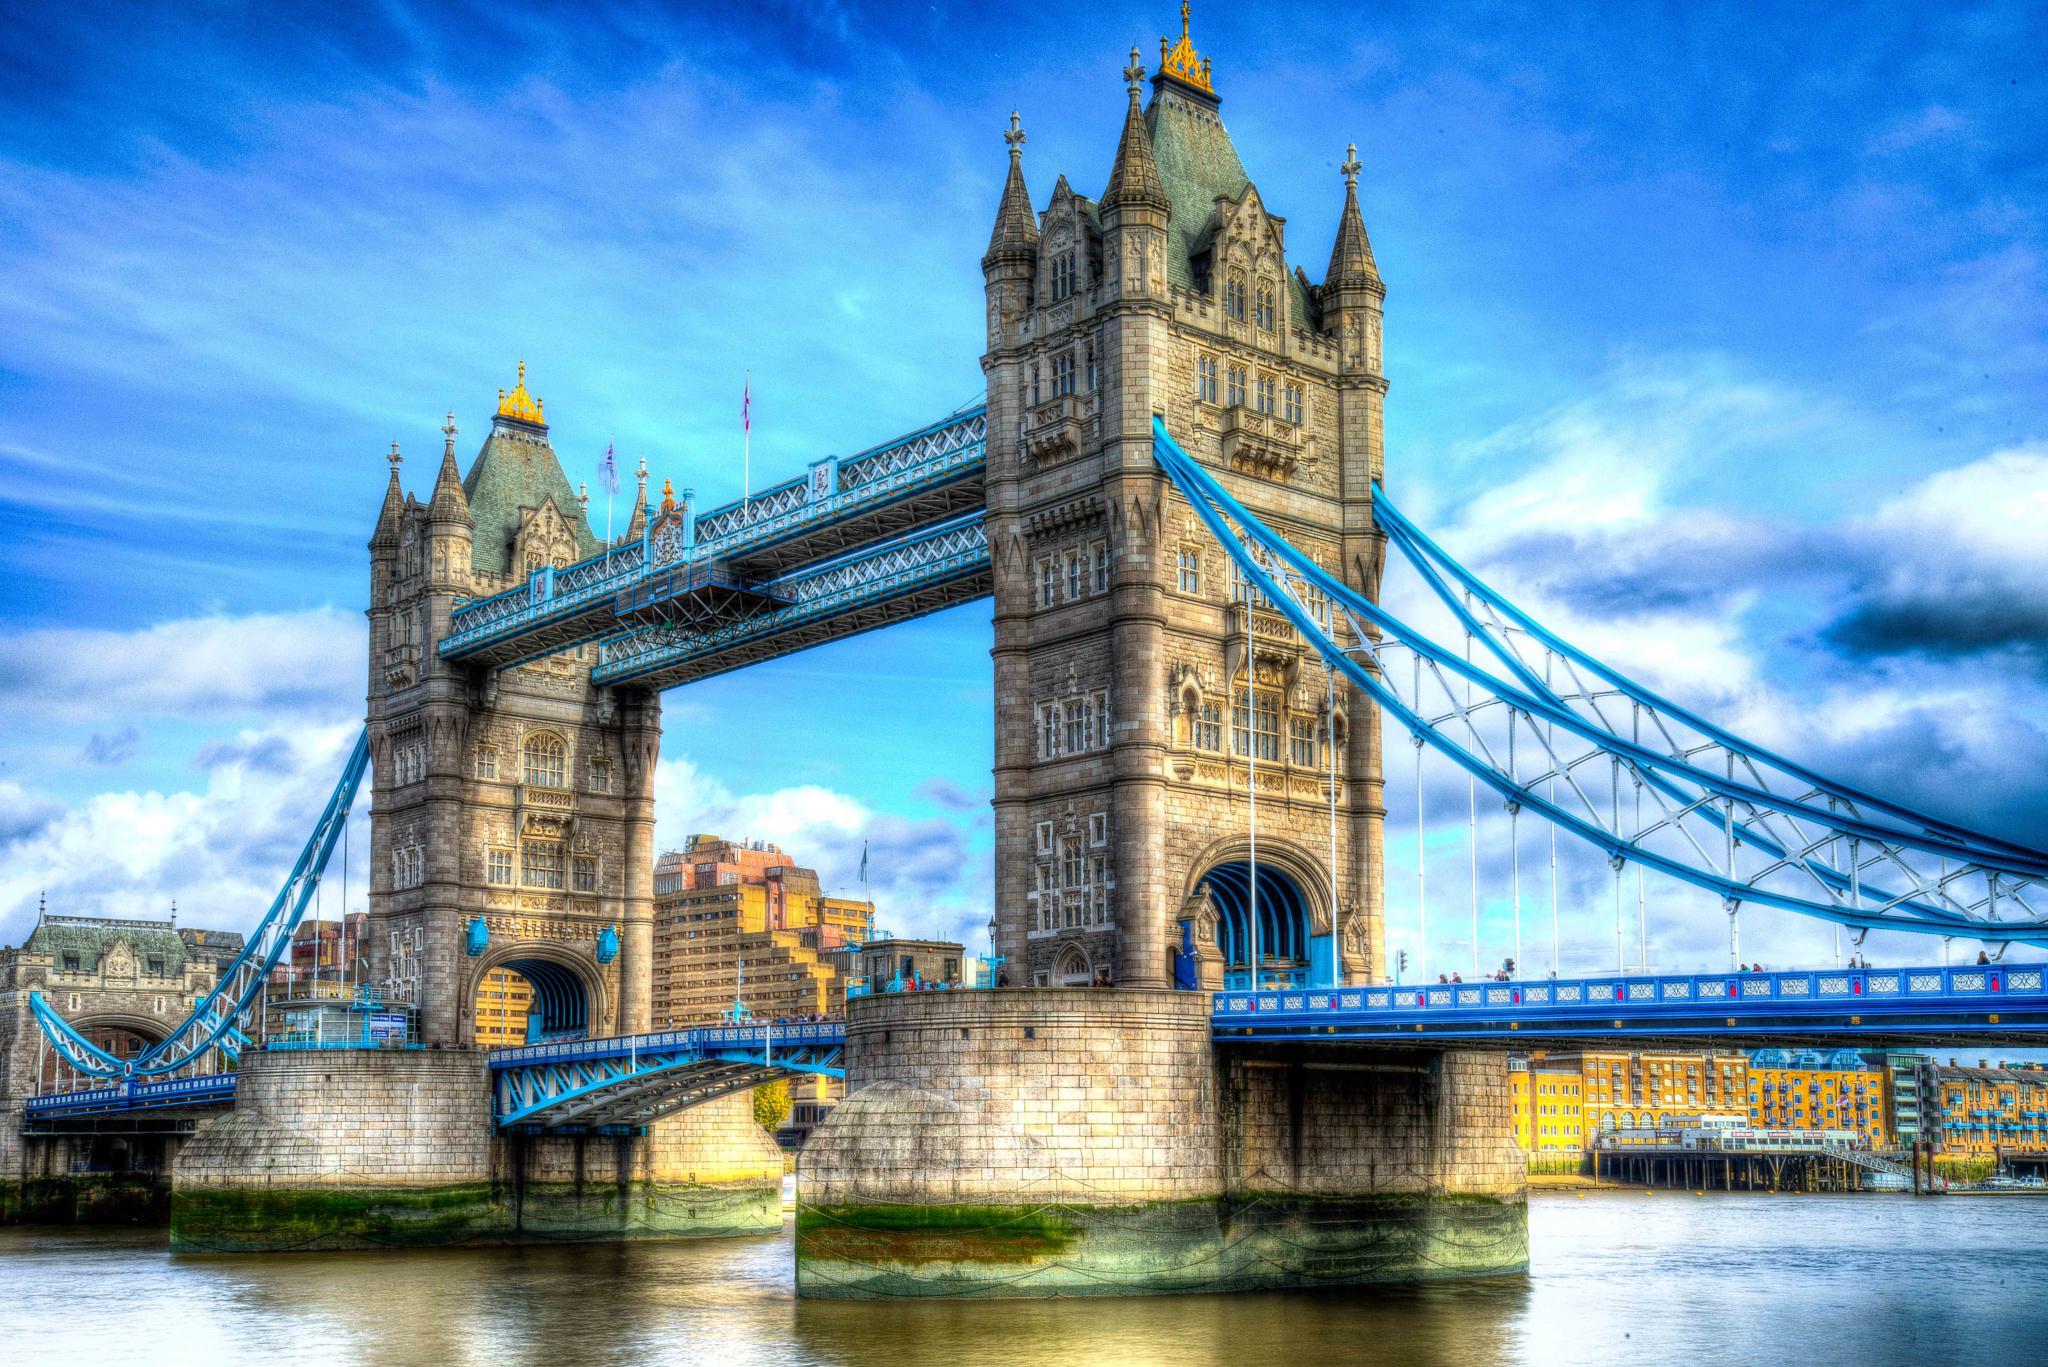 London - Tower Bridge by Lukas Proszowski